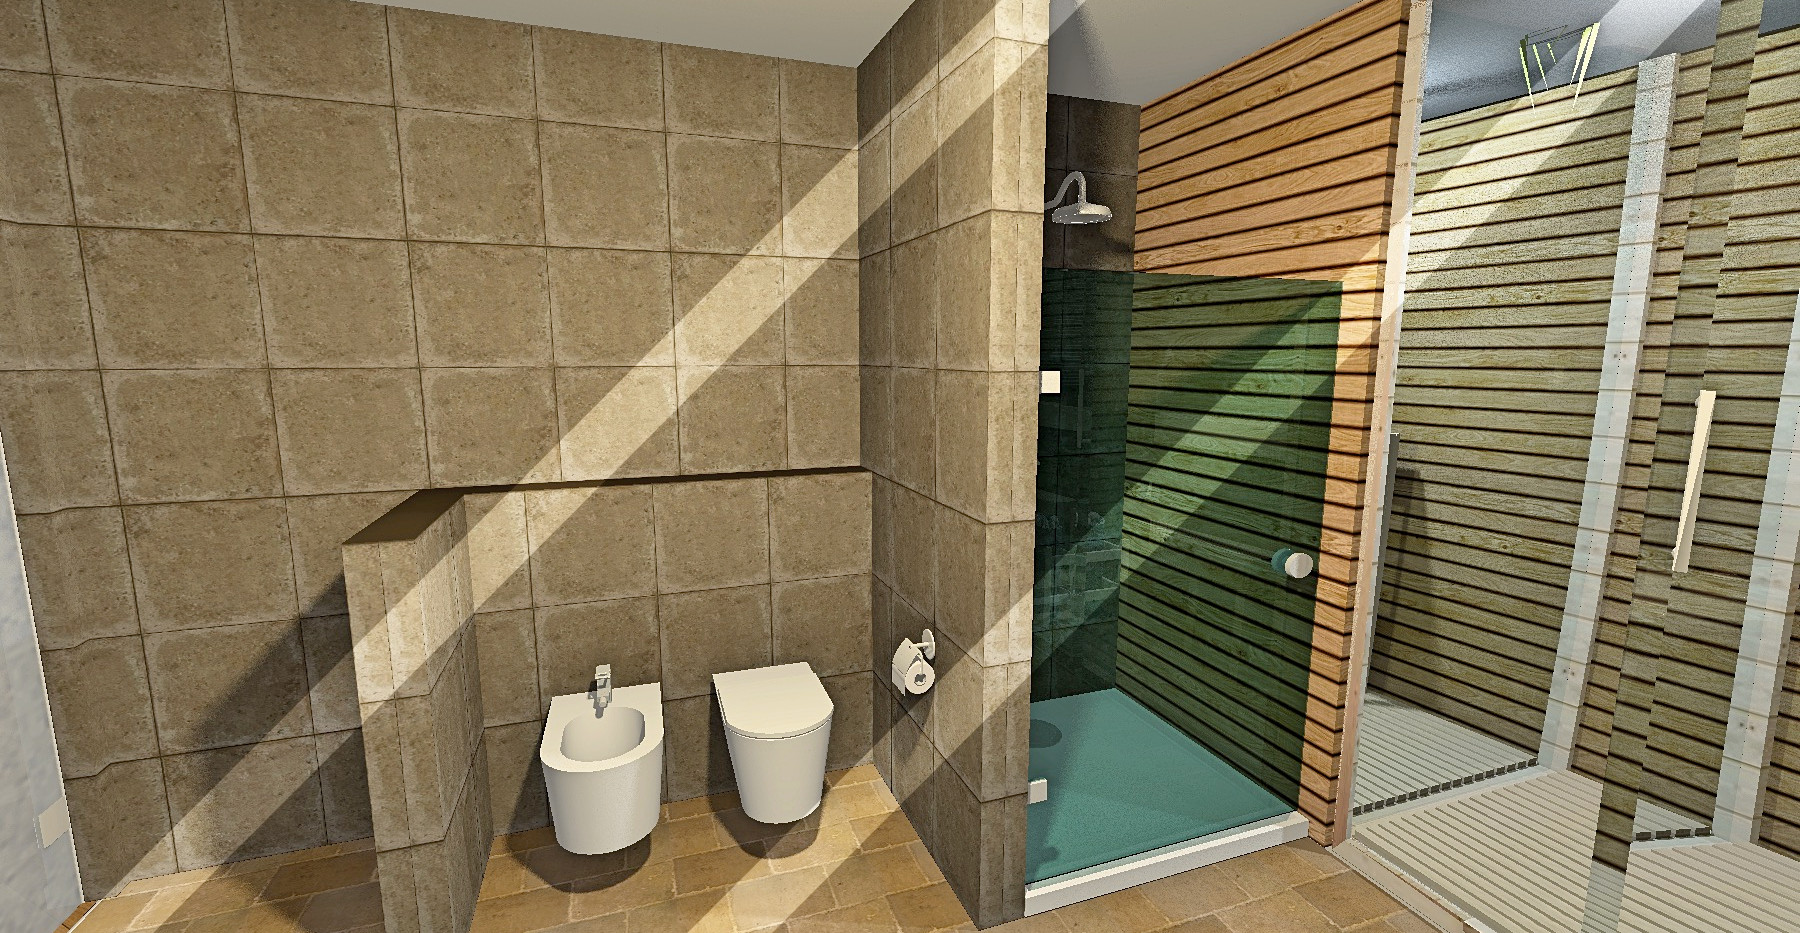 Bathroom EG1 1_Fotor.jpg